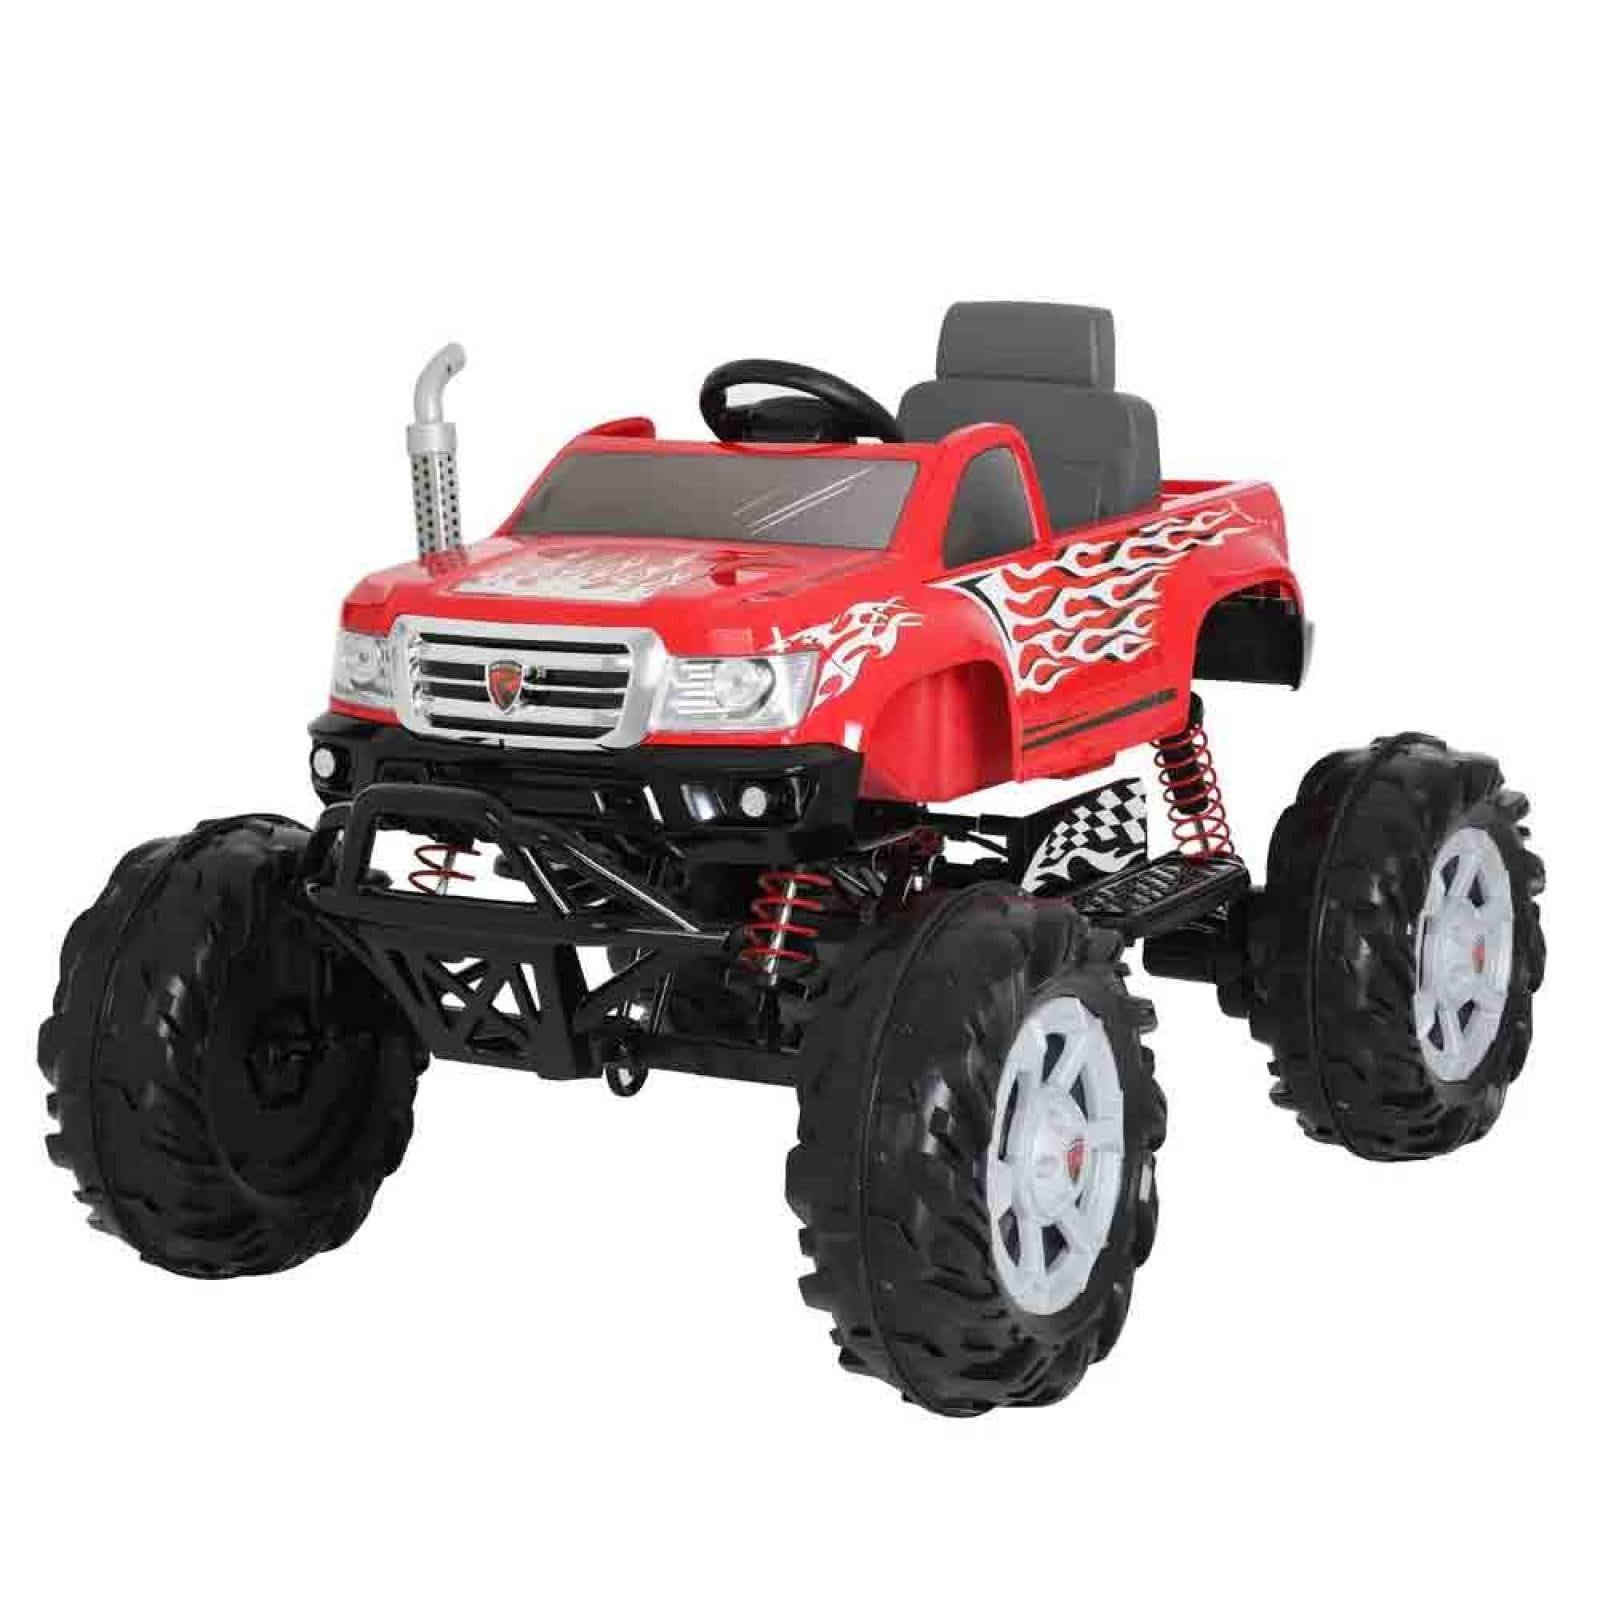 Camioneta Electrica Monster Truck Niño Juguete 20V Rojo Prinsel